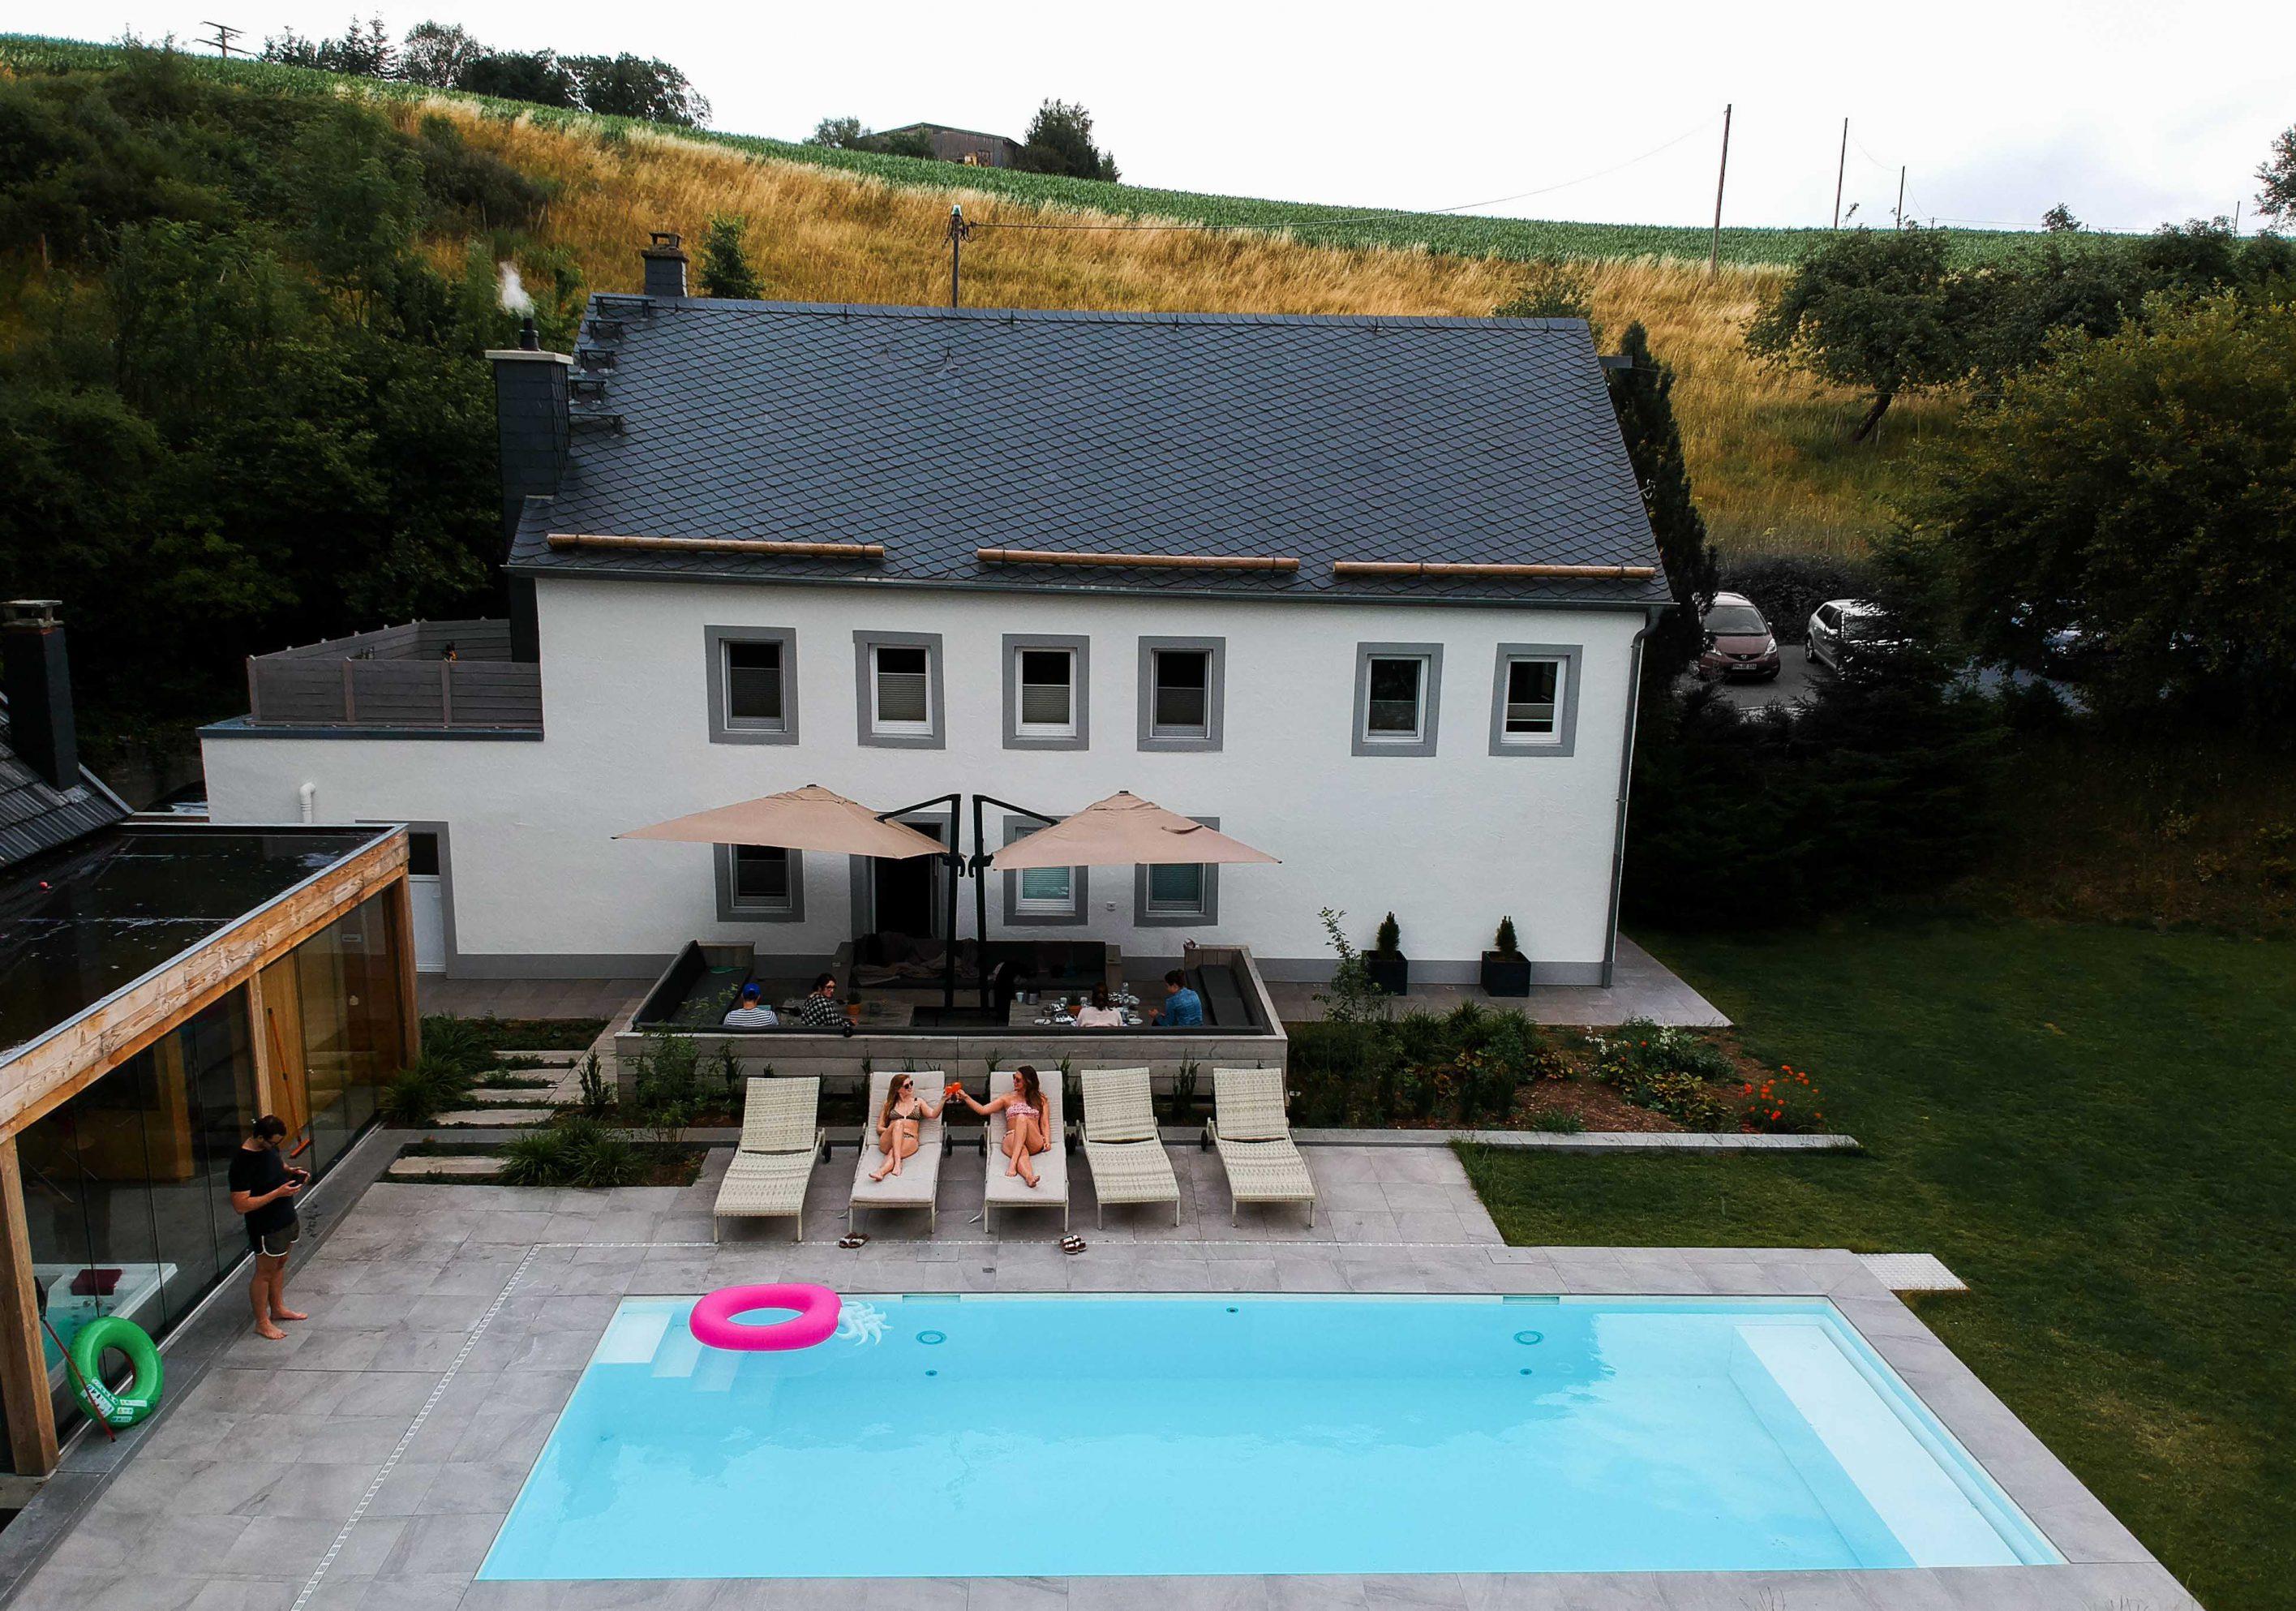 Geburtstagsfeier-Location-Villa-Eifel-Deutschland-besondere-Location-JGA-Villa-mieten-Muxerath-Villa-Steinshof-Hasenhof-Pool